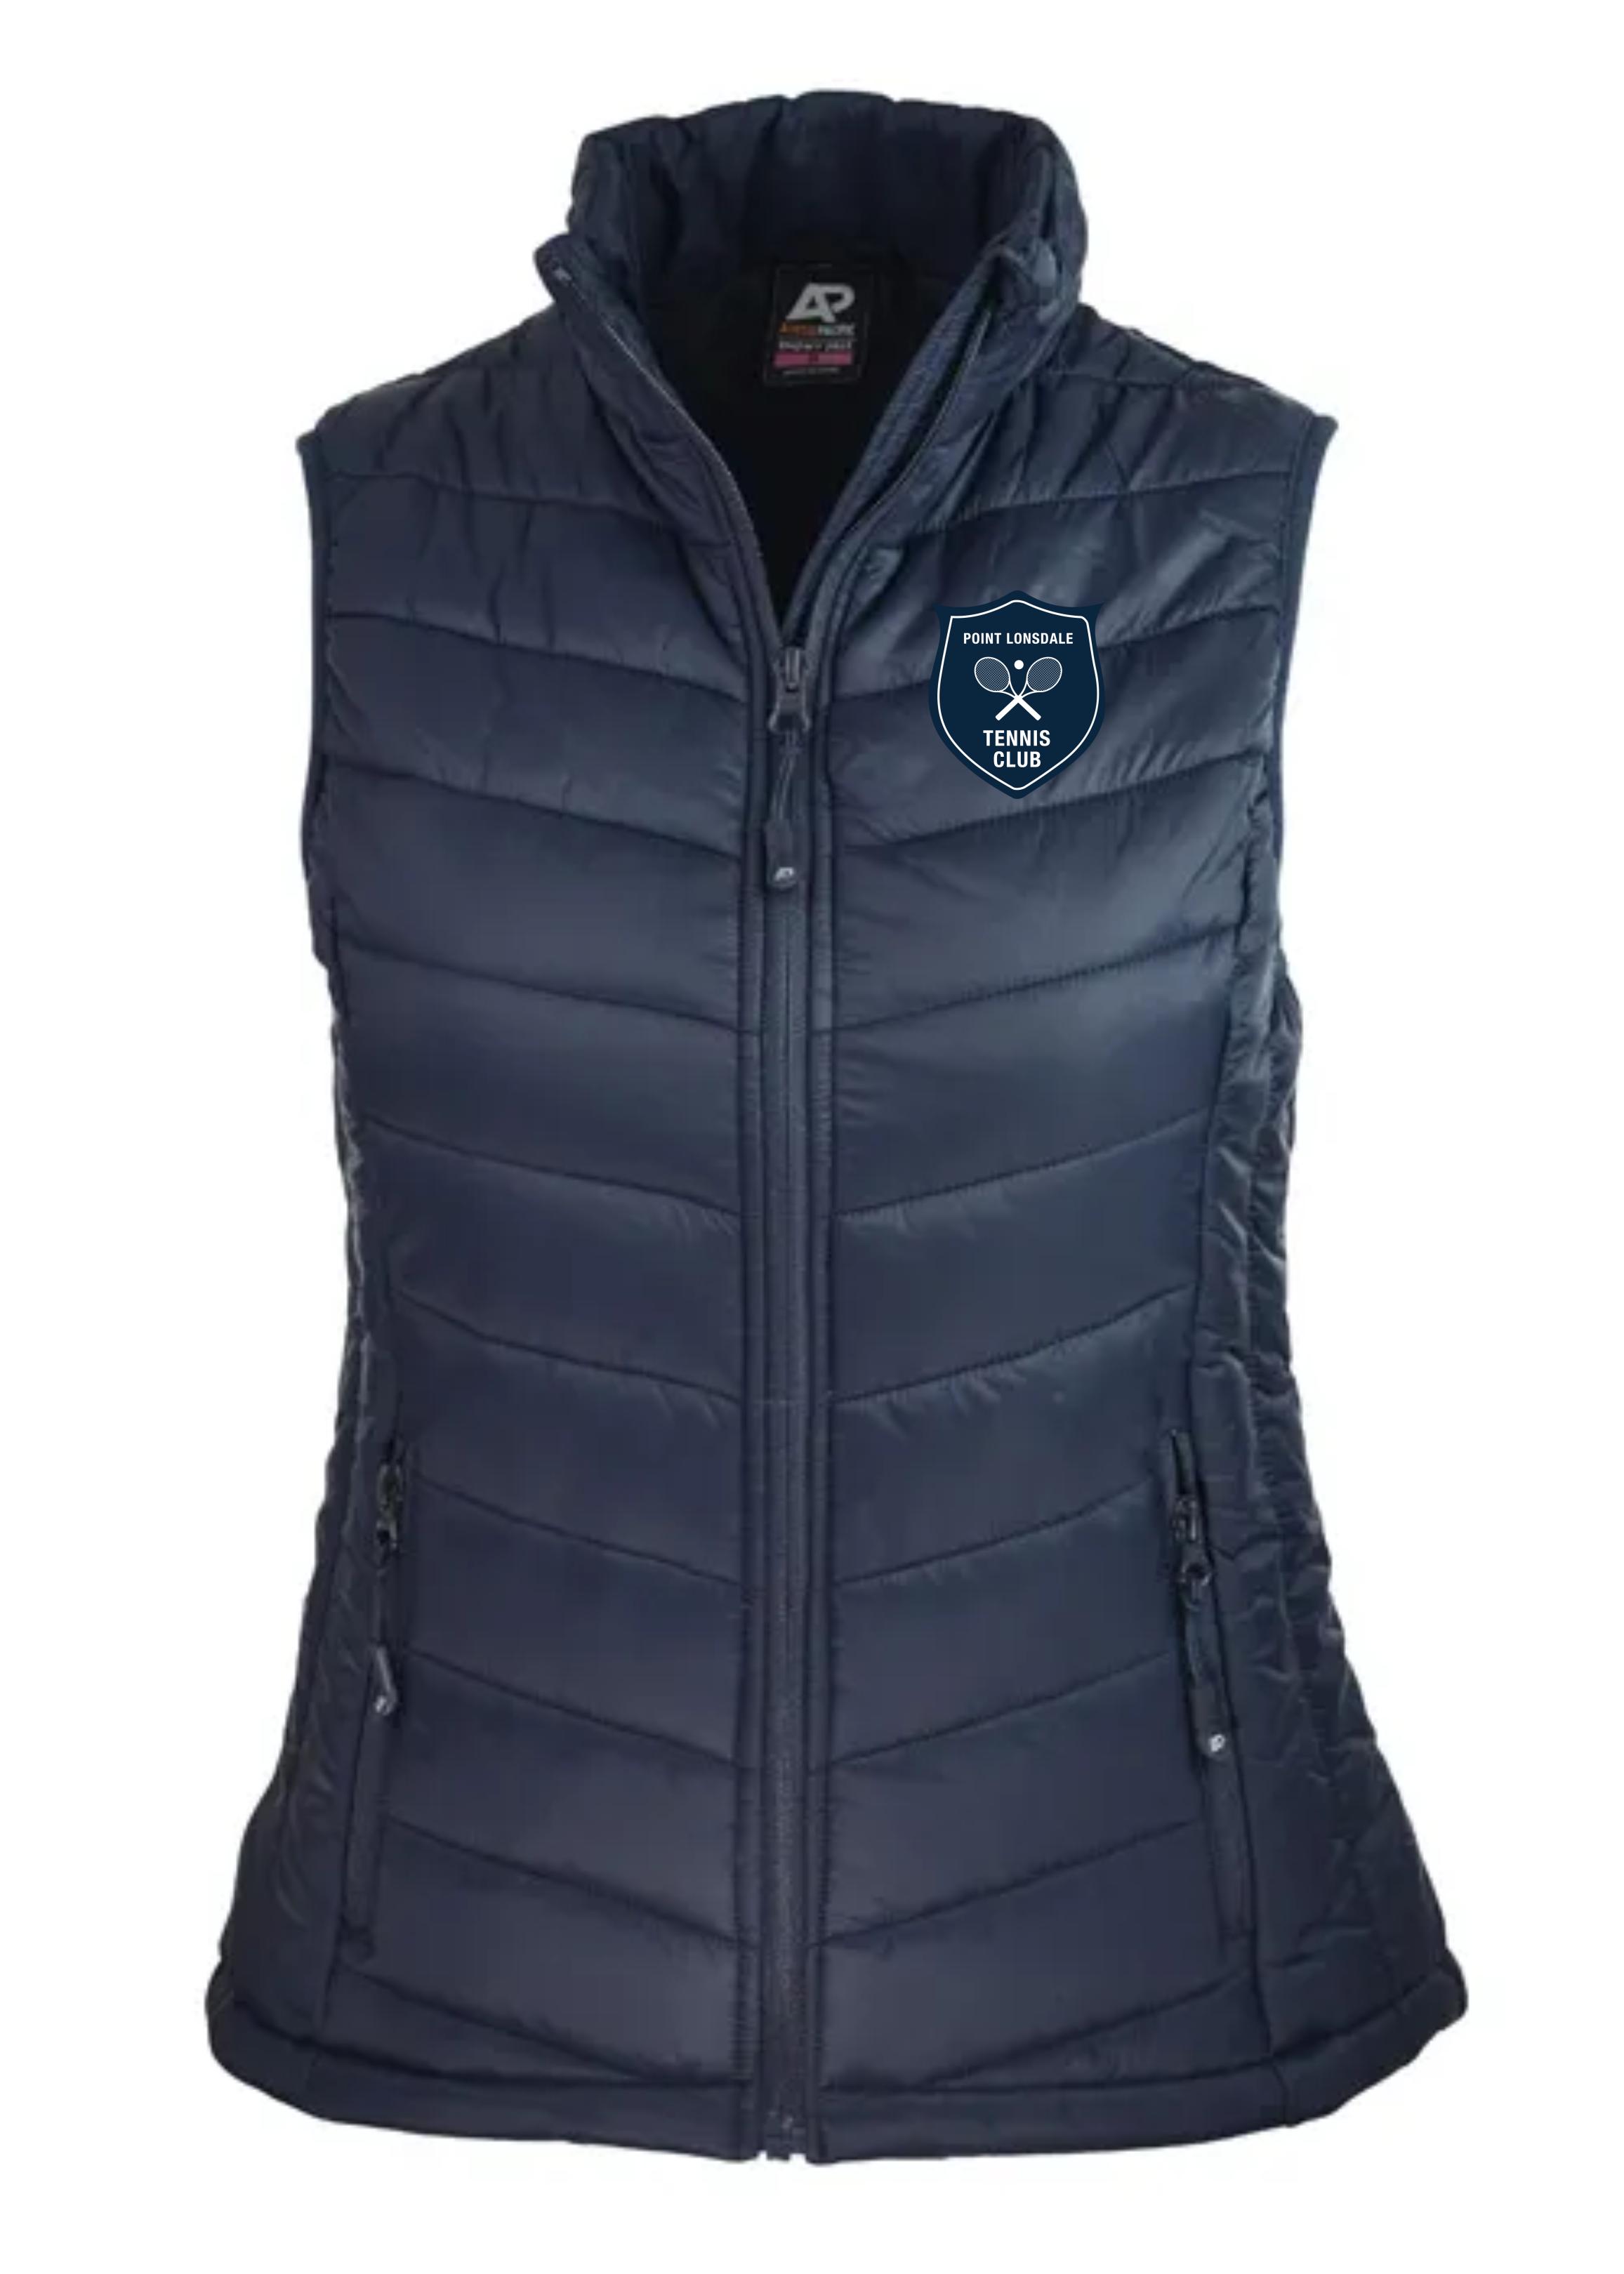 Ladies Snowy Puffer Vest in Navy